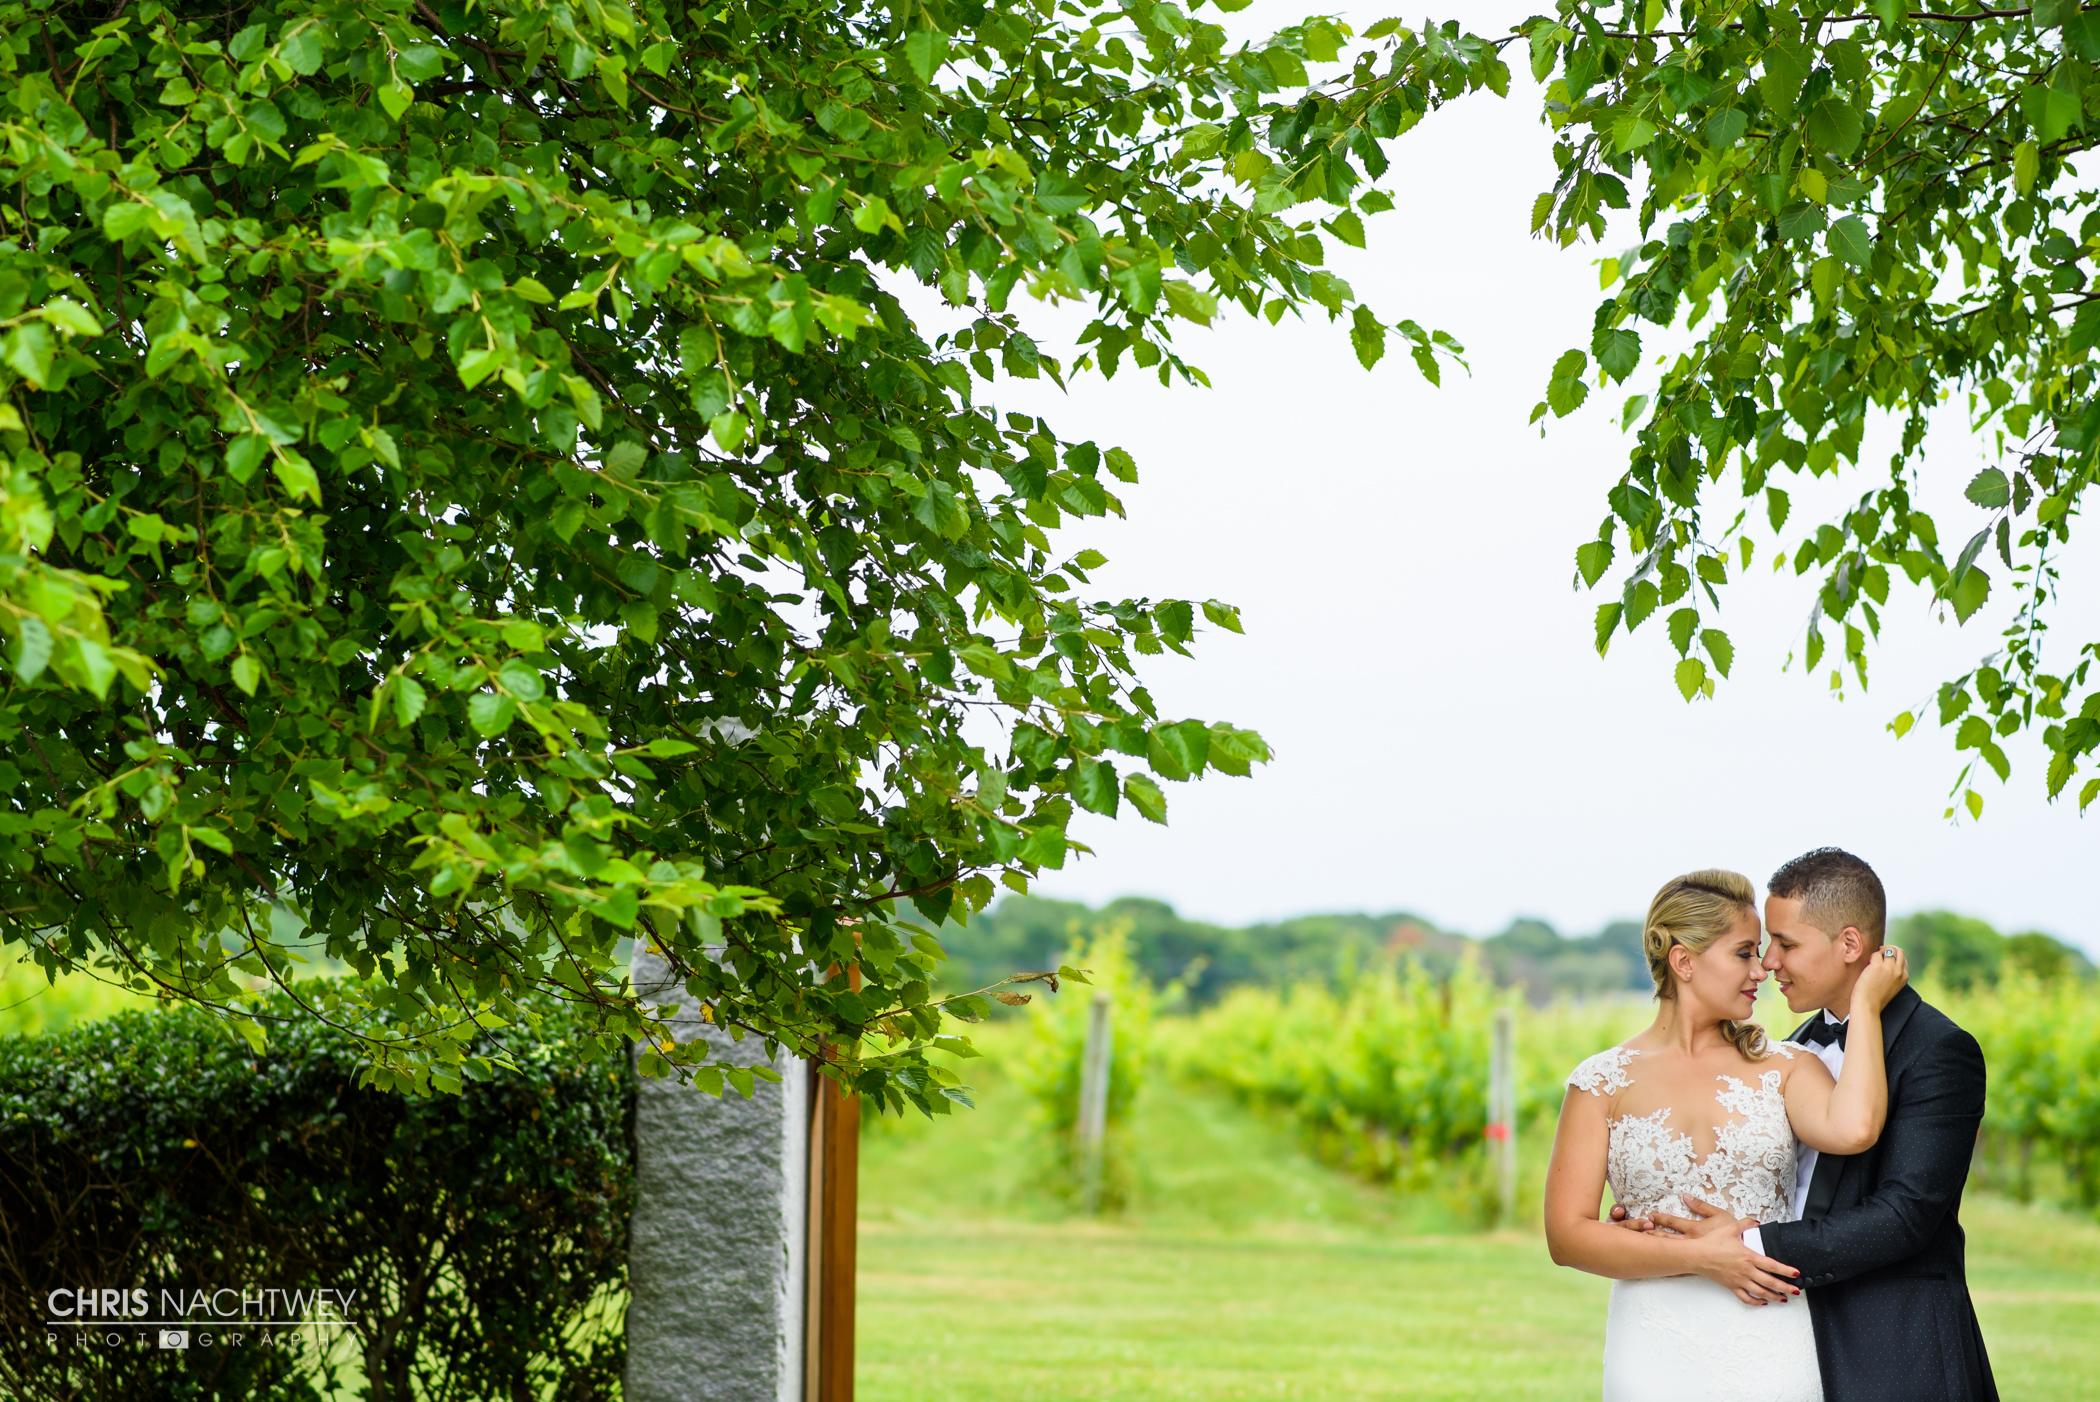 wedding-saltwater-farm-vineyard-photos-stonington-ct-chris-nachtwey-photography-2016-ana-austin-17.jpg